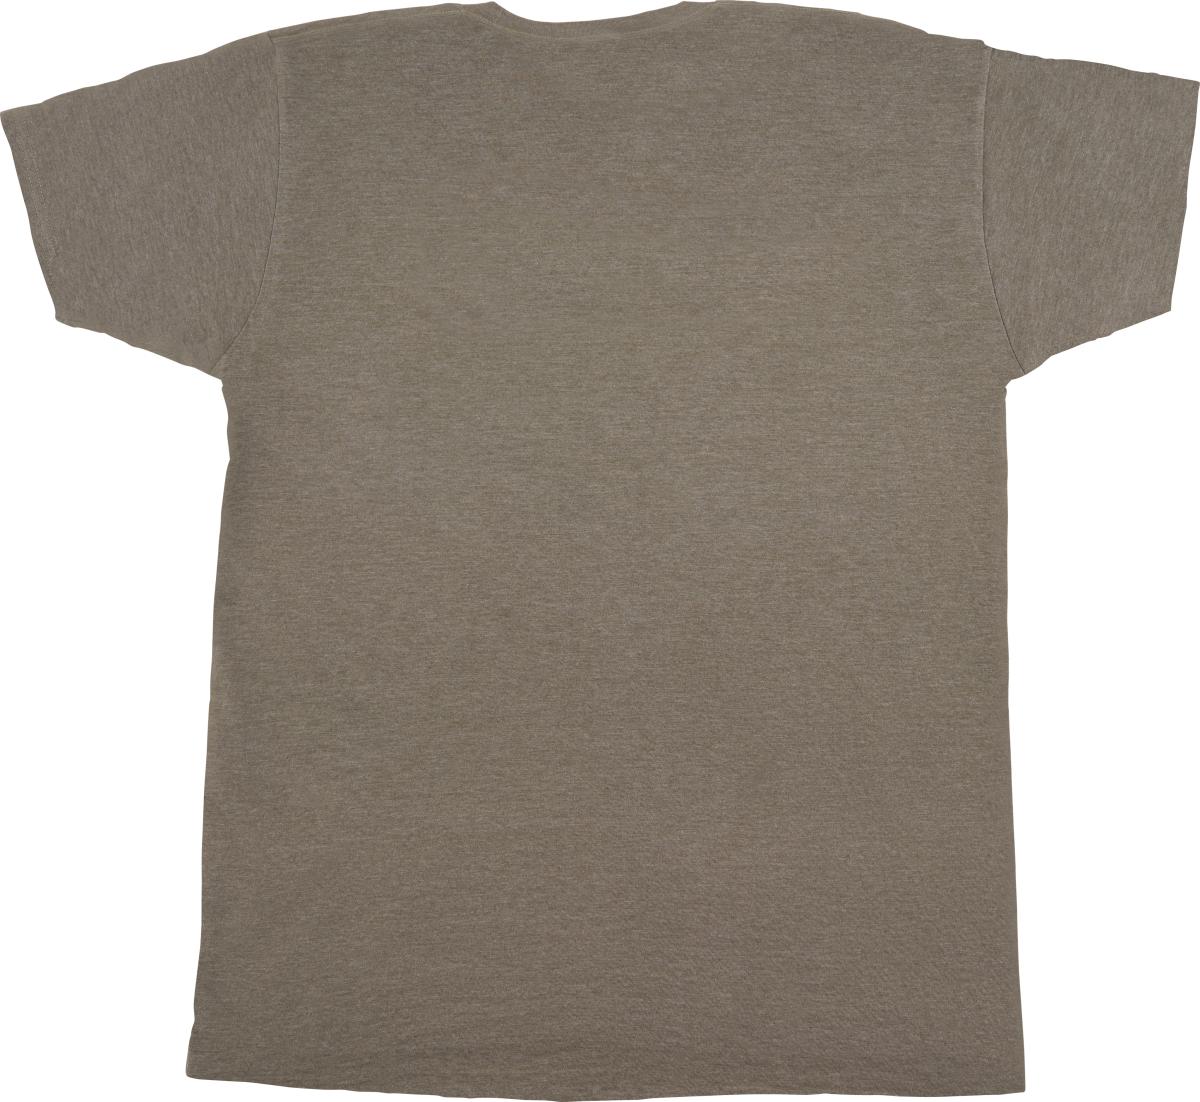 Charvel Charvel® Toothpaste Logo T-Shirt, Heather Green, XXL